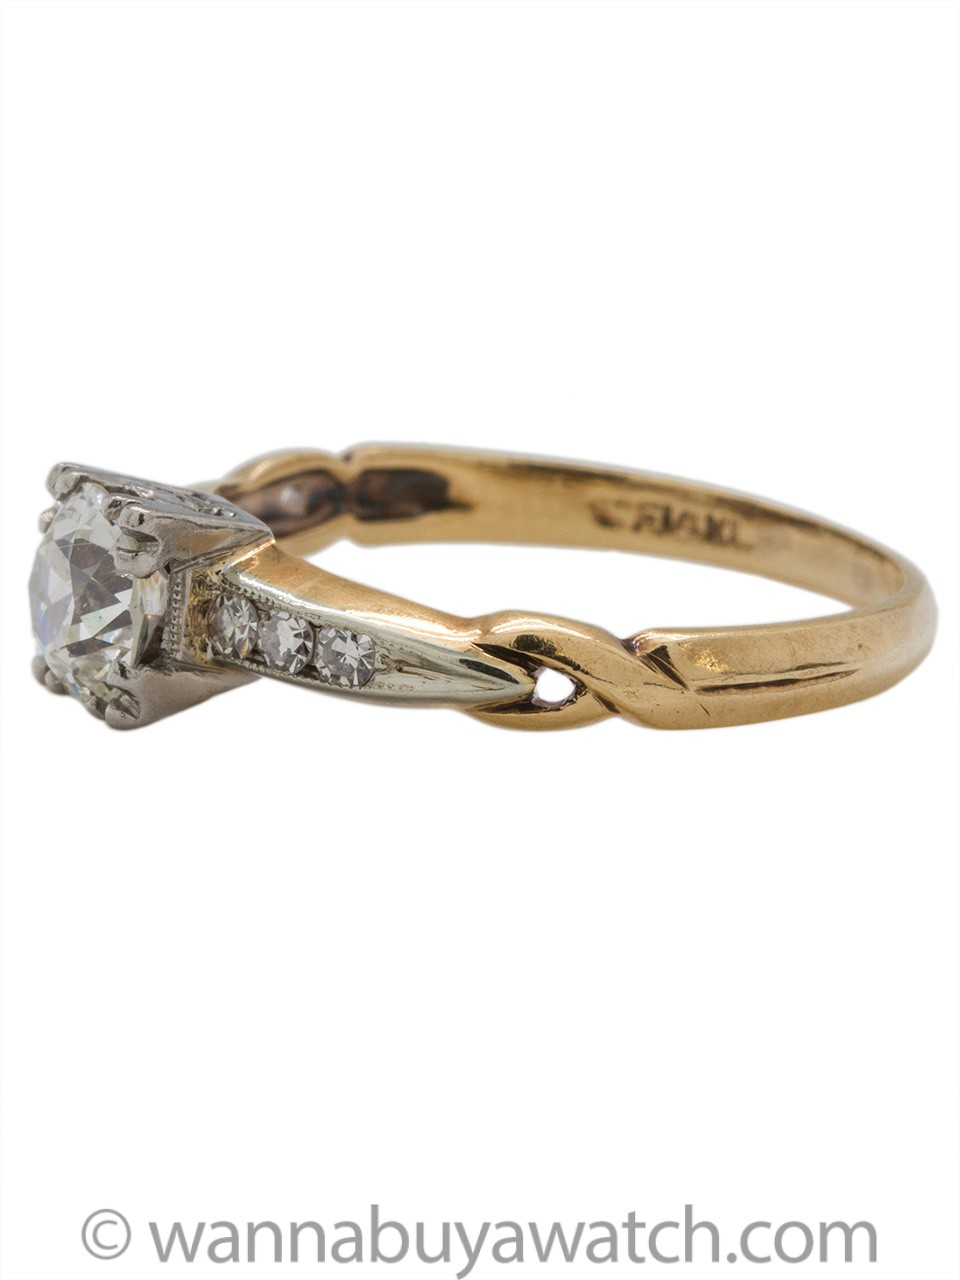 Vintage Diamond Engagement Ring 14K YG 0.50ct Old European Cut G-SI2 circa 1940s